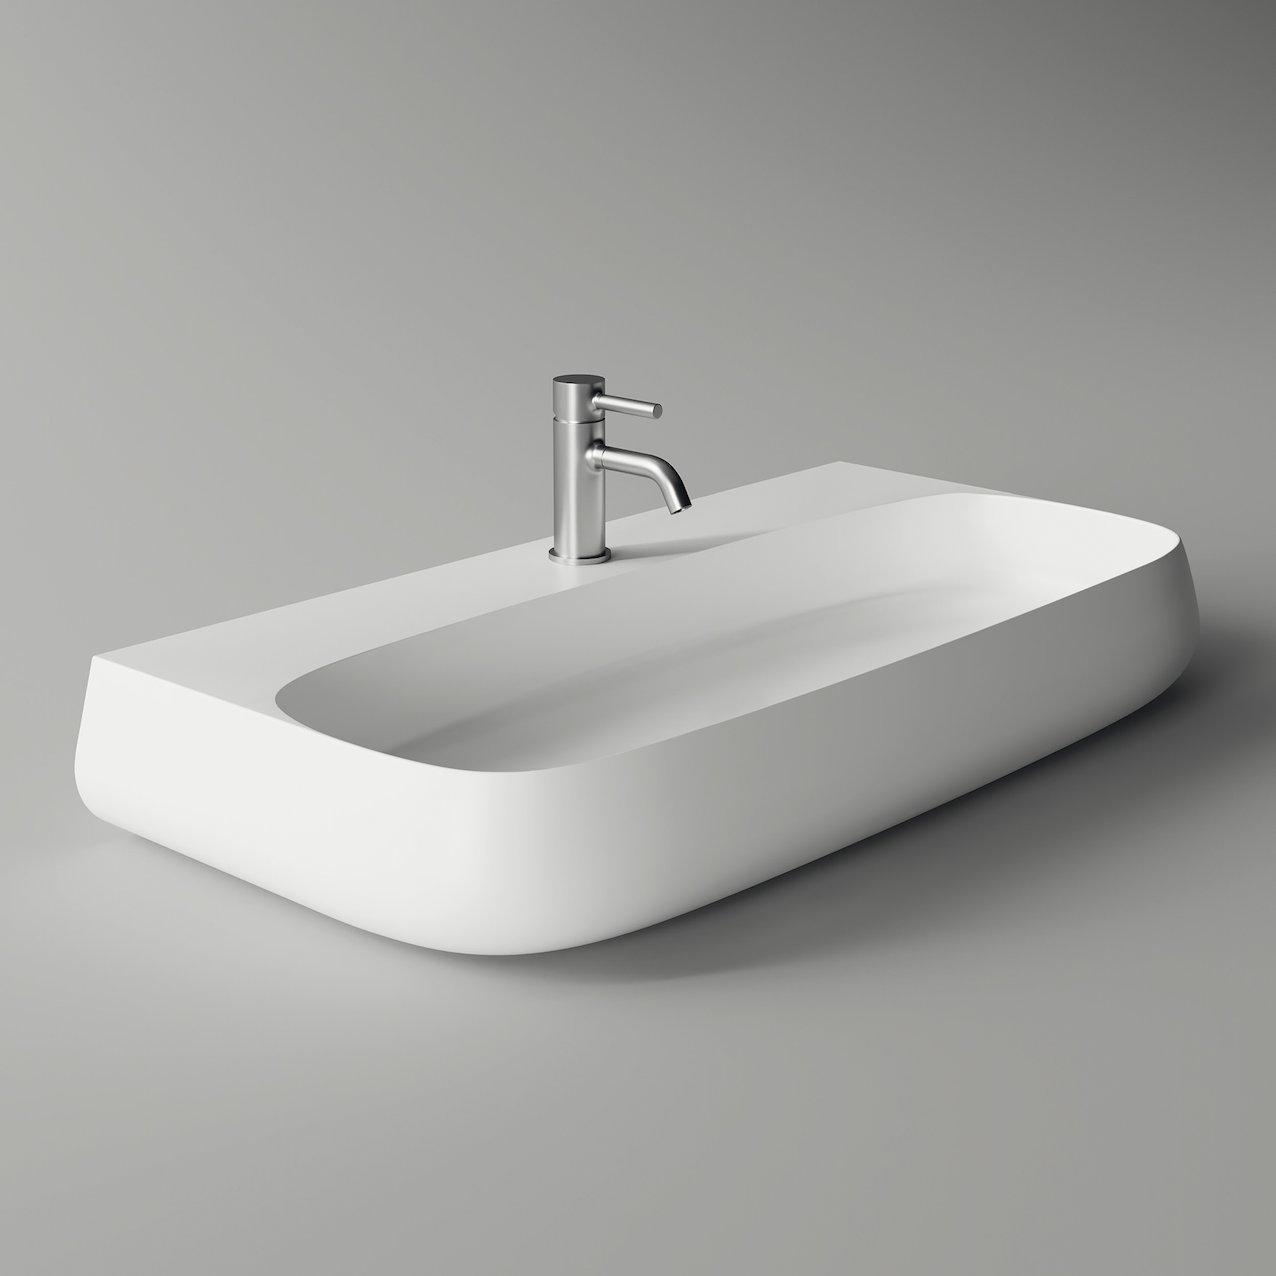 Lavabo NUR 90x45 cm